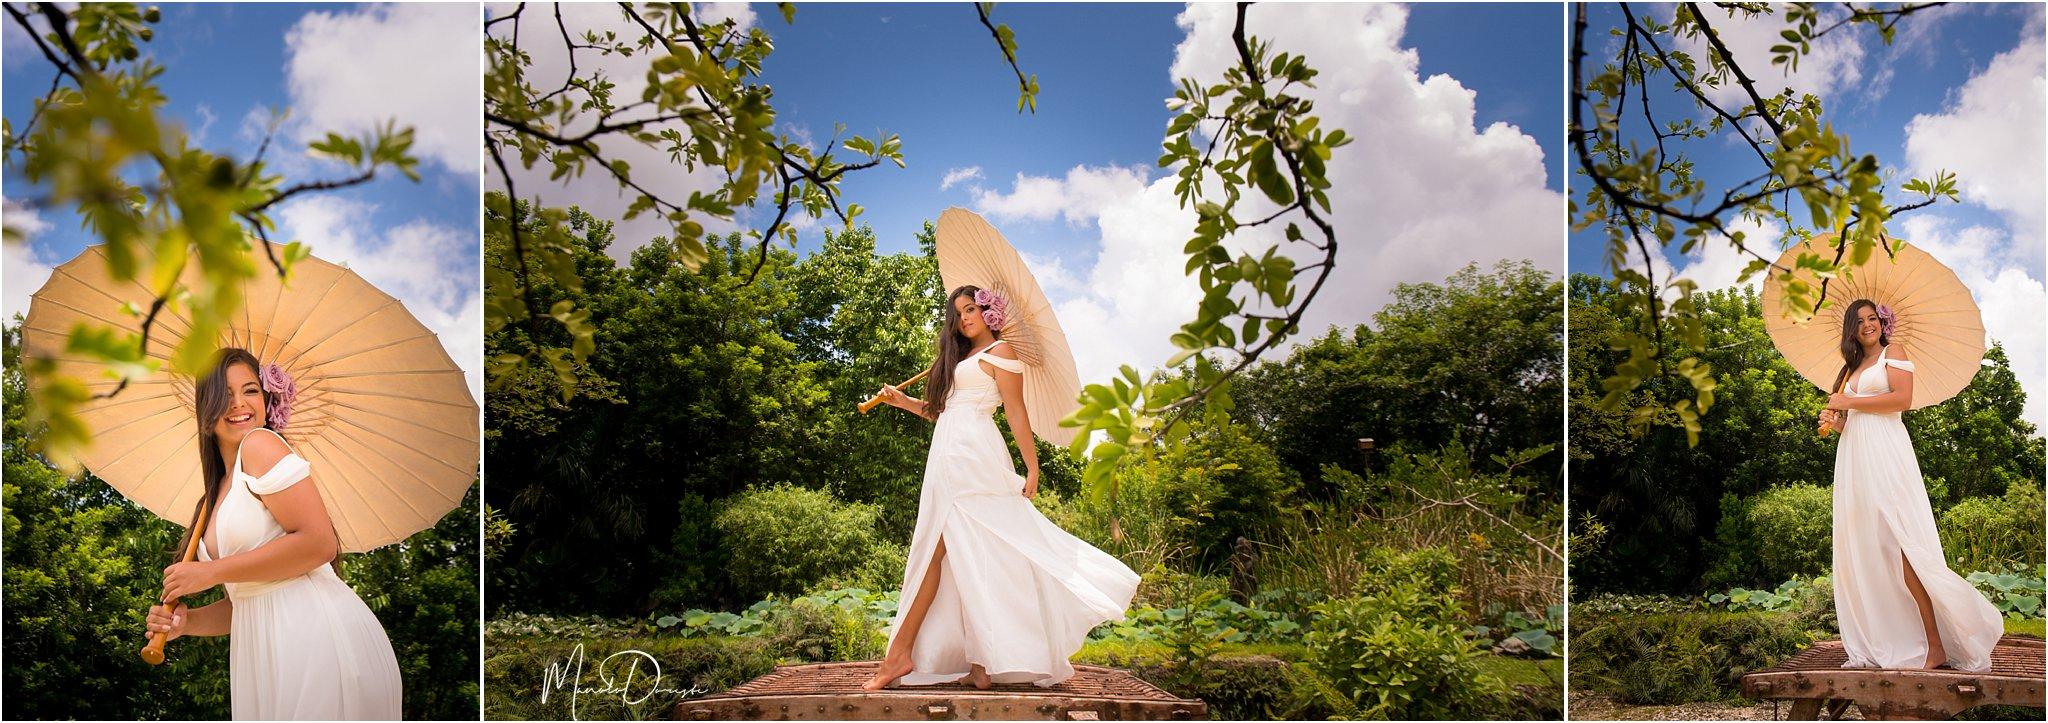 0341_ManoloDoreste_InFocusStudios_Wedding_Family_Photography_Miami_MiamiPhotographer.jpg